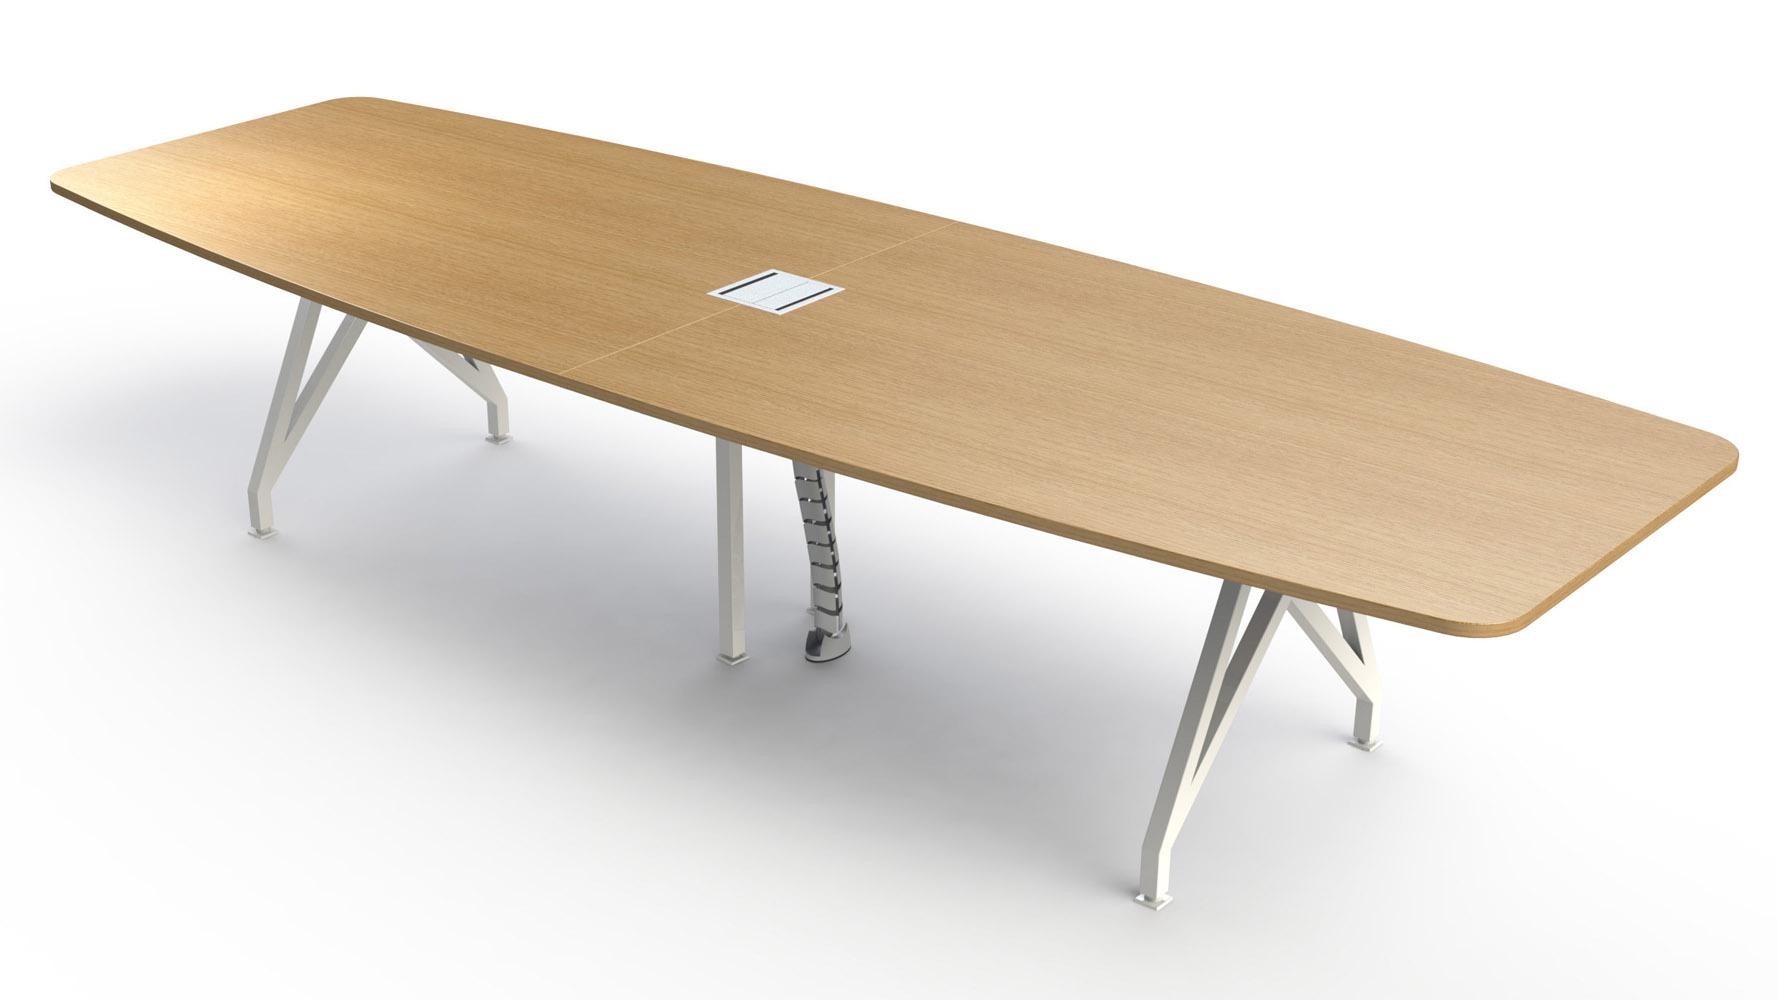 KAYAK Conference Table 12 Zuri Furniture : modernscale1to1thinktankkayakconferencetable12ftmaple1 from www.zurifurniture.com size 1778 x 1000 jpeg 144kB